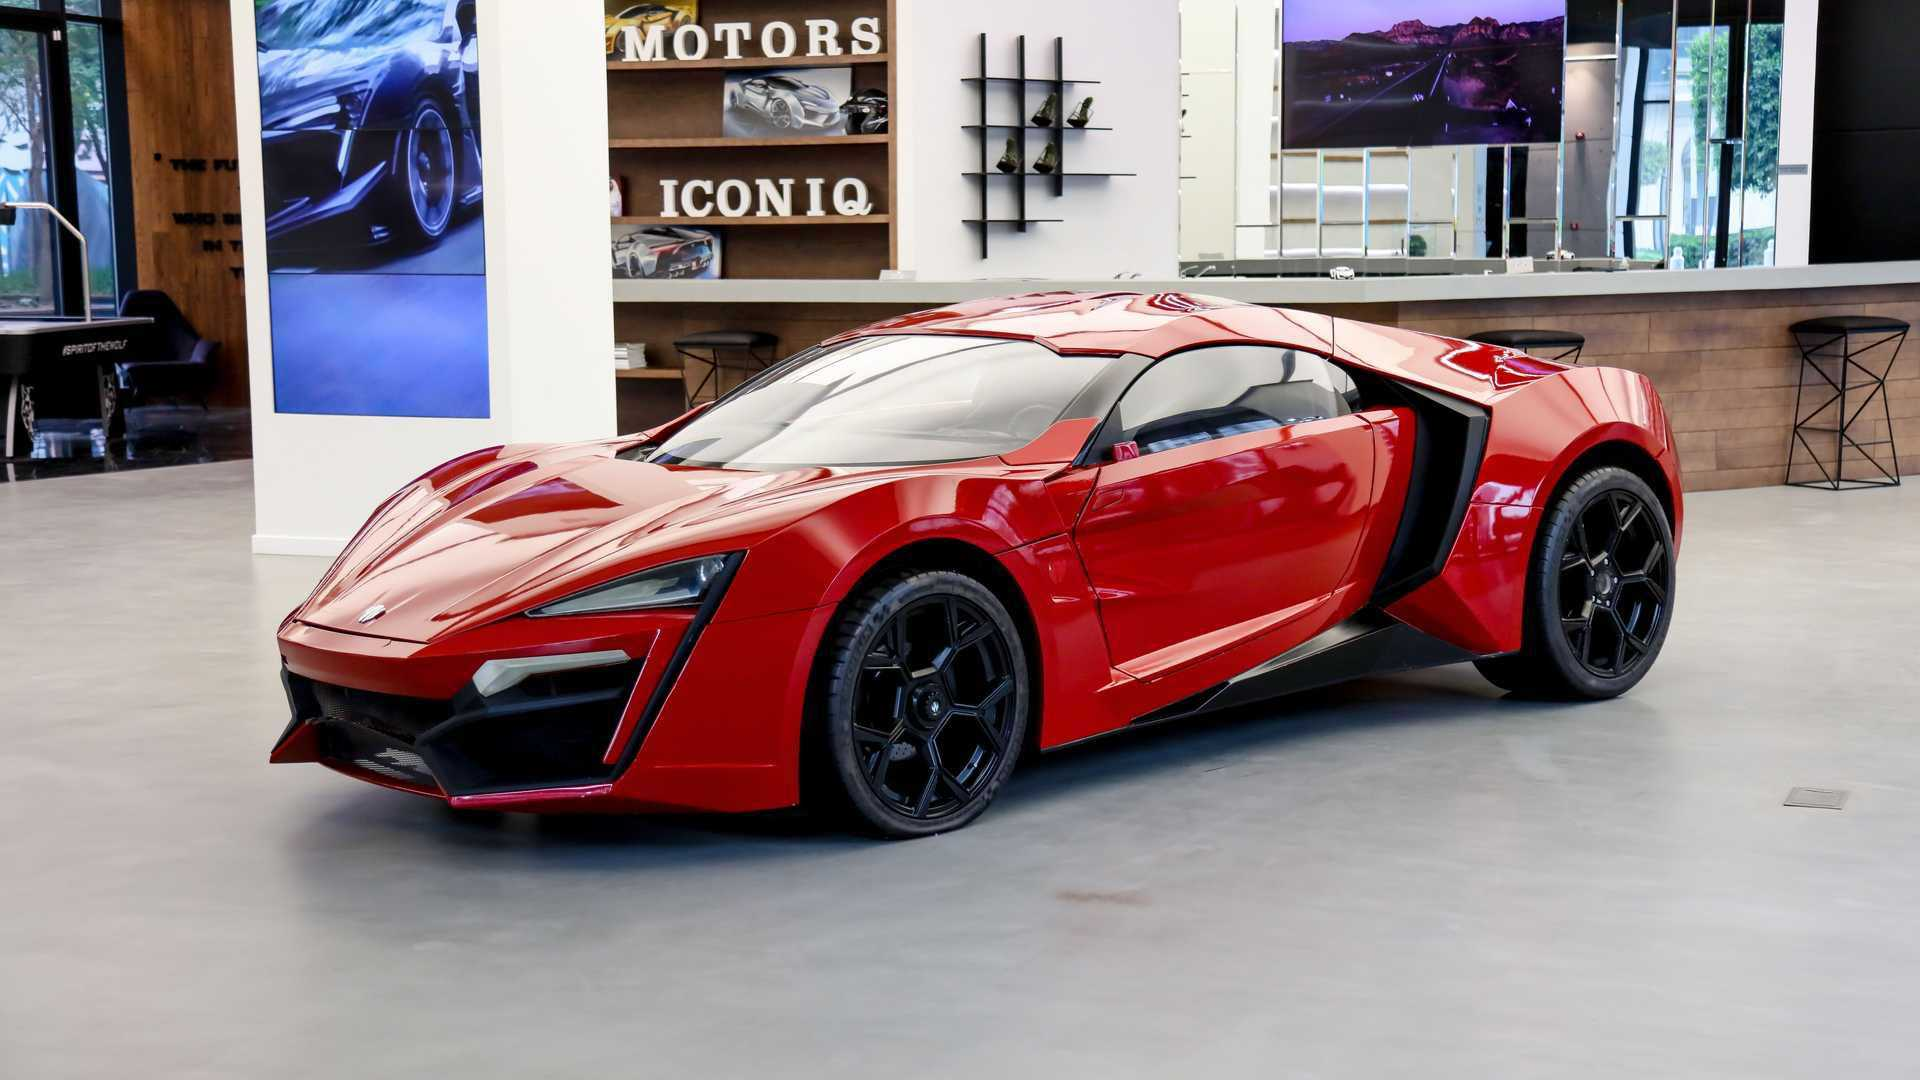 Lykan_HyperSport_stunt_car_sale-0001